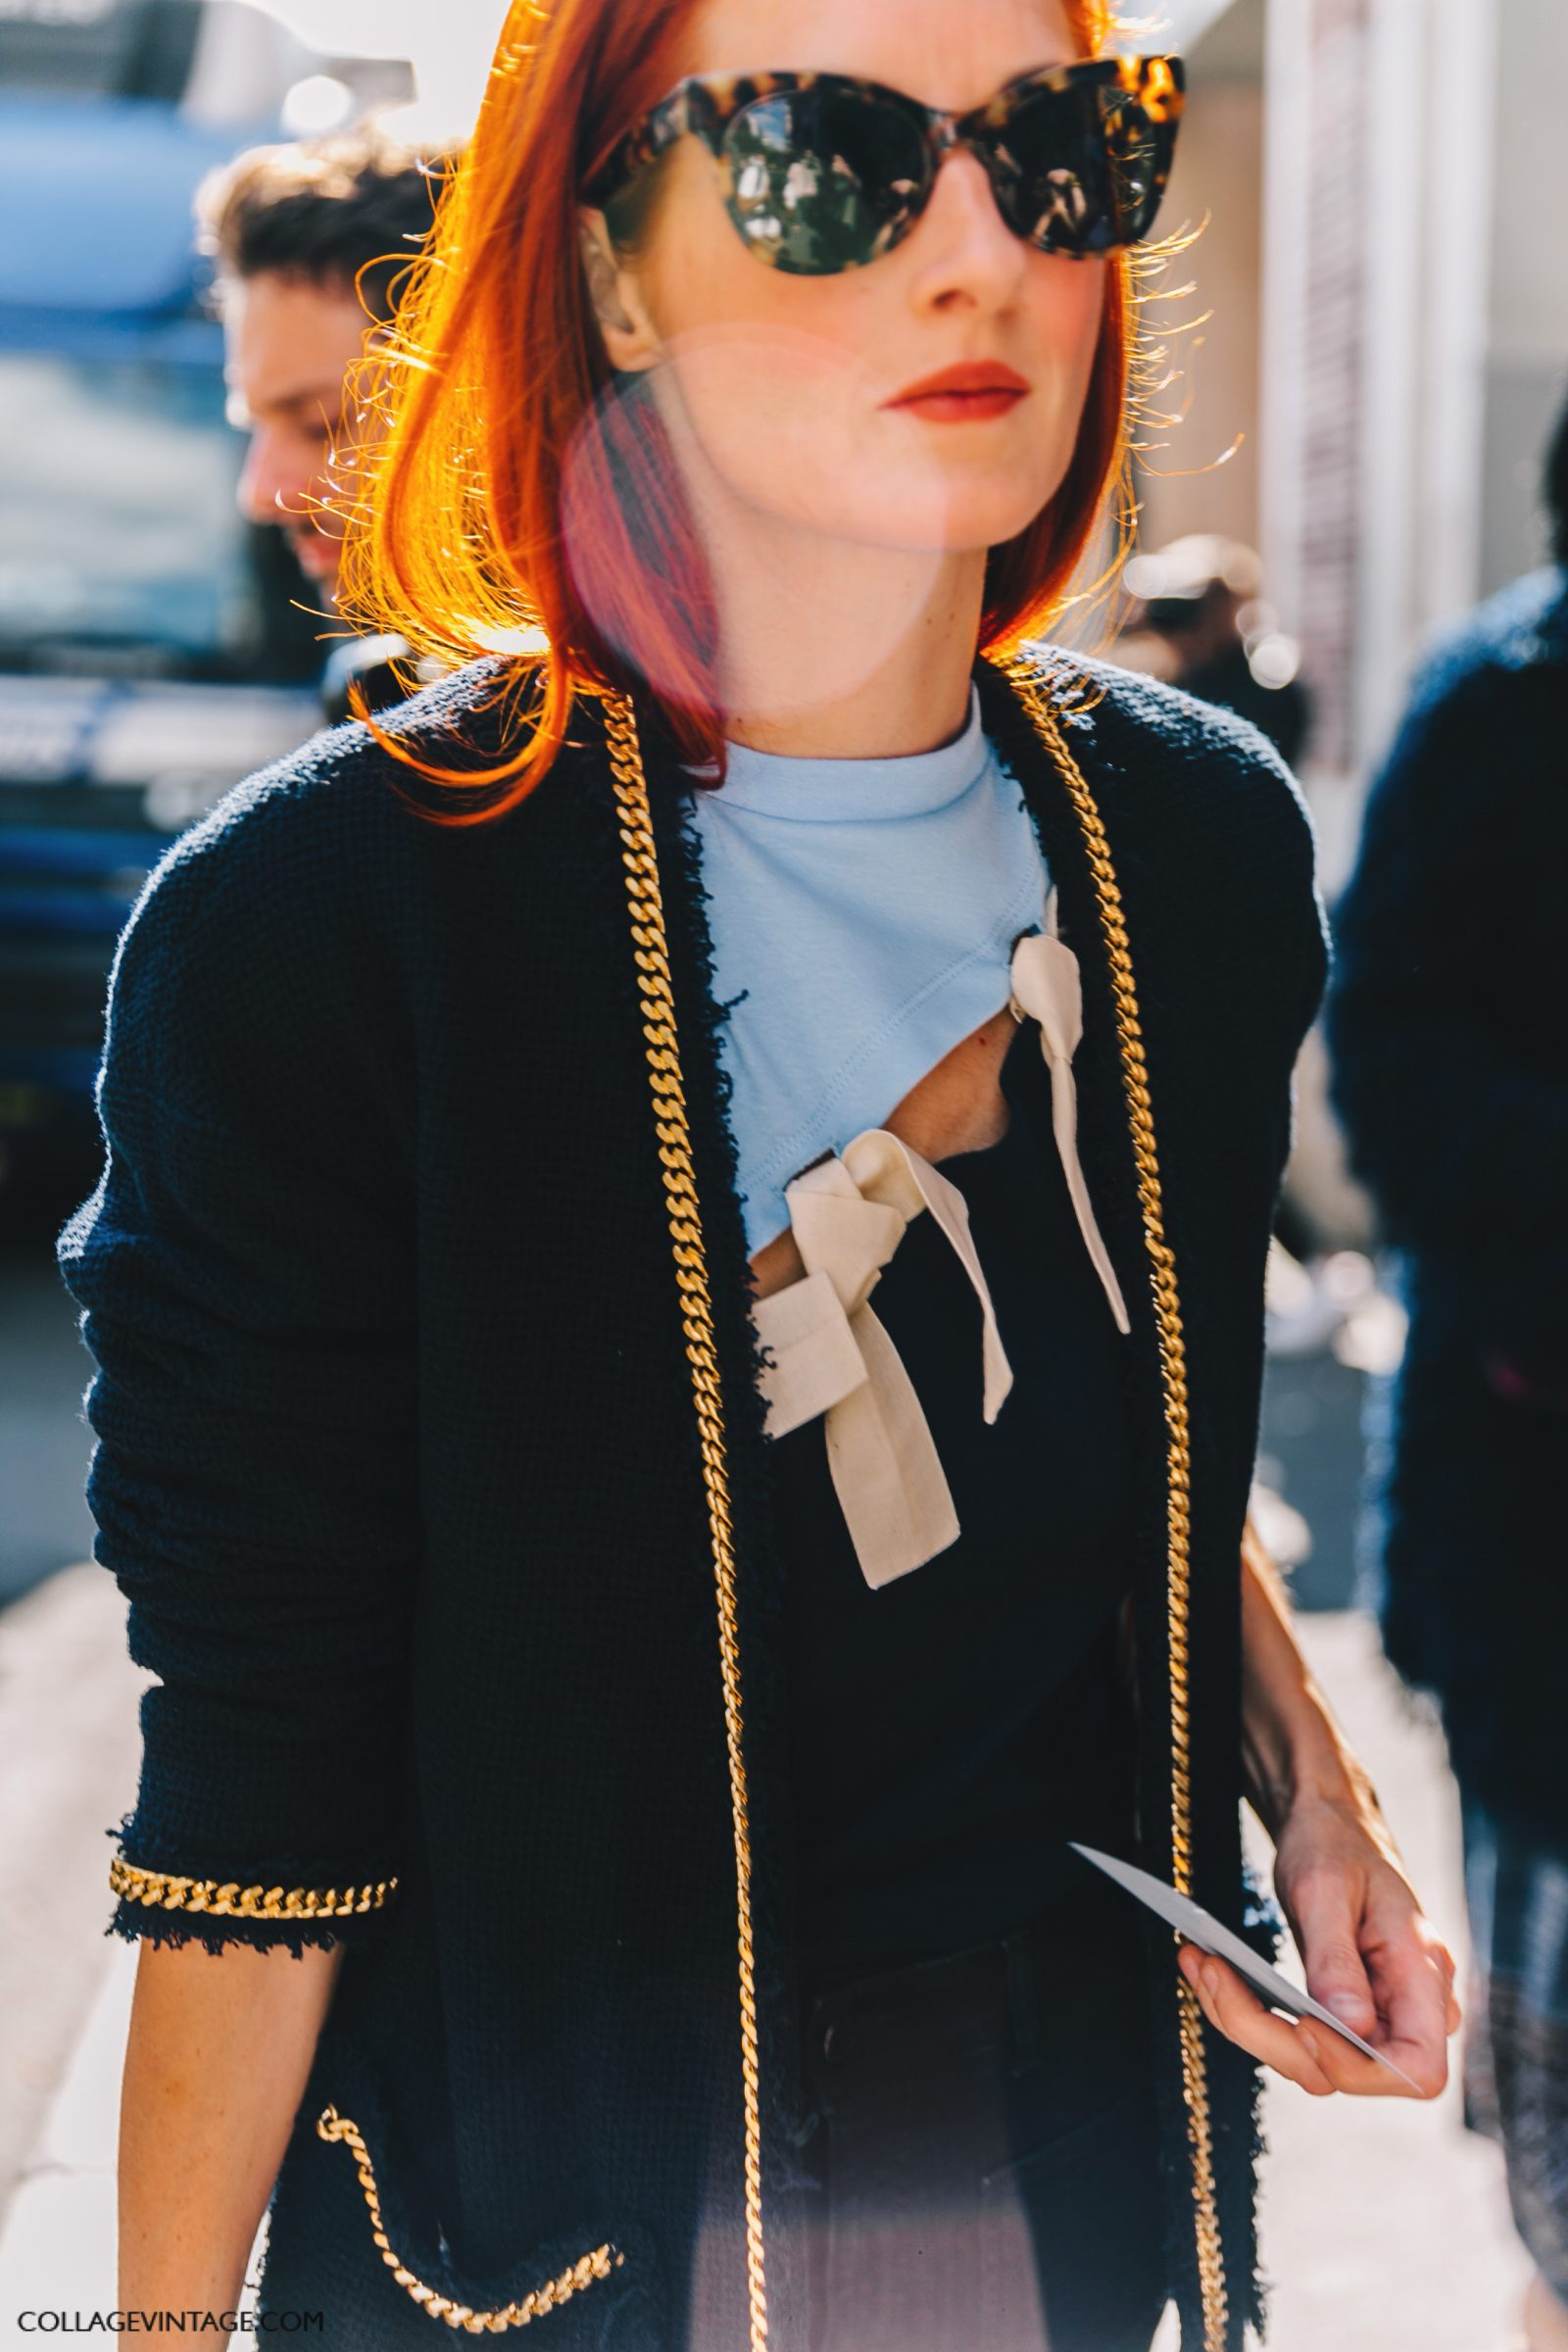 pfw-paris_fashion_week_ss17-street_style-outfits-collage_vintage-rochas-courreges-dries_van_noten-lanvin-guy_laroche-172